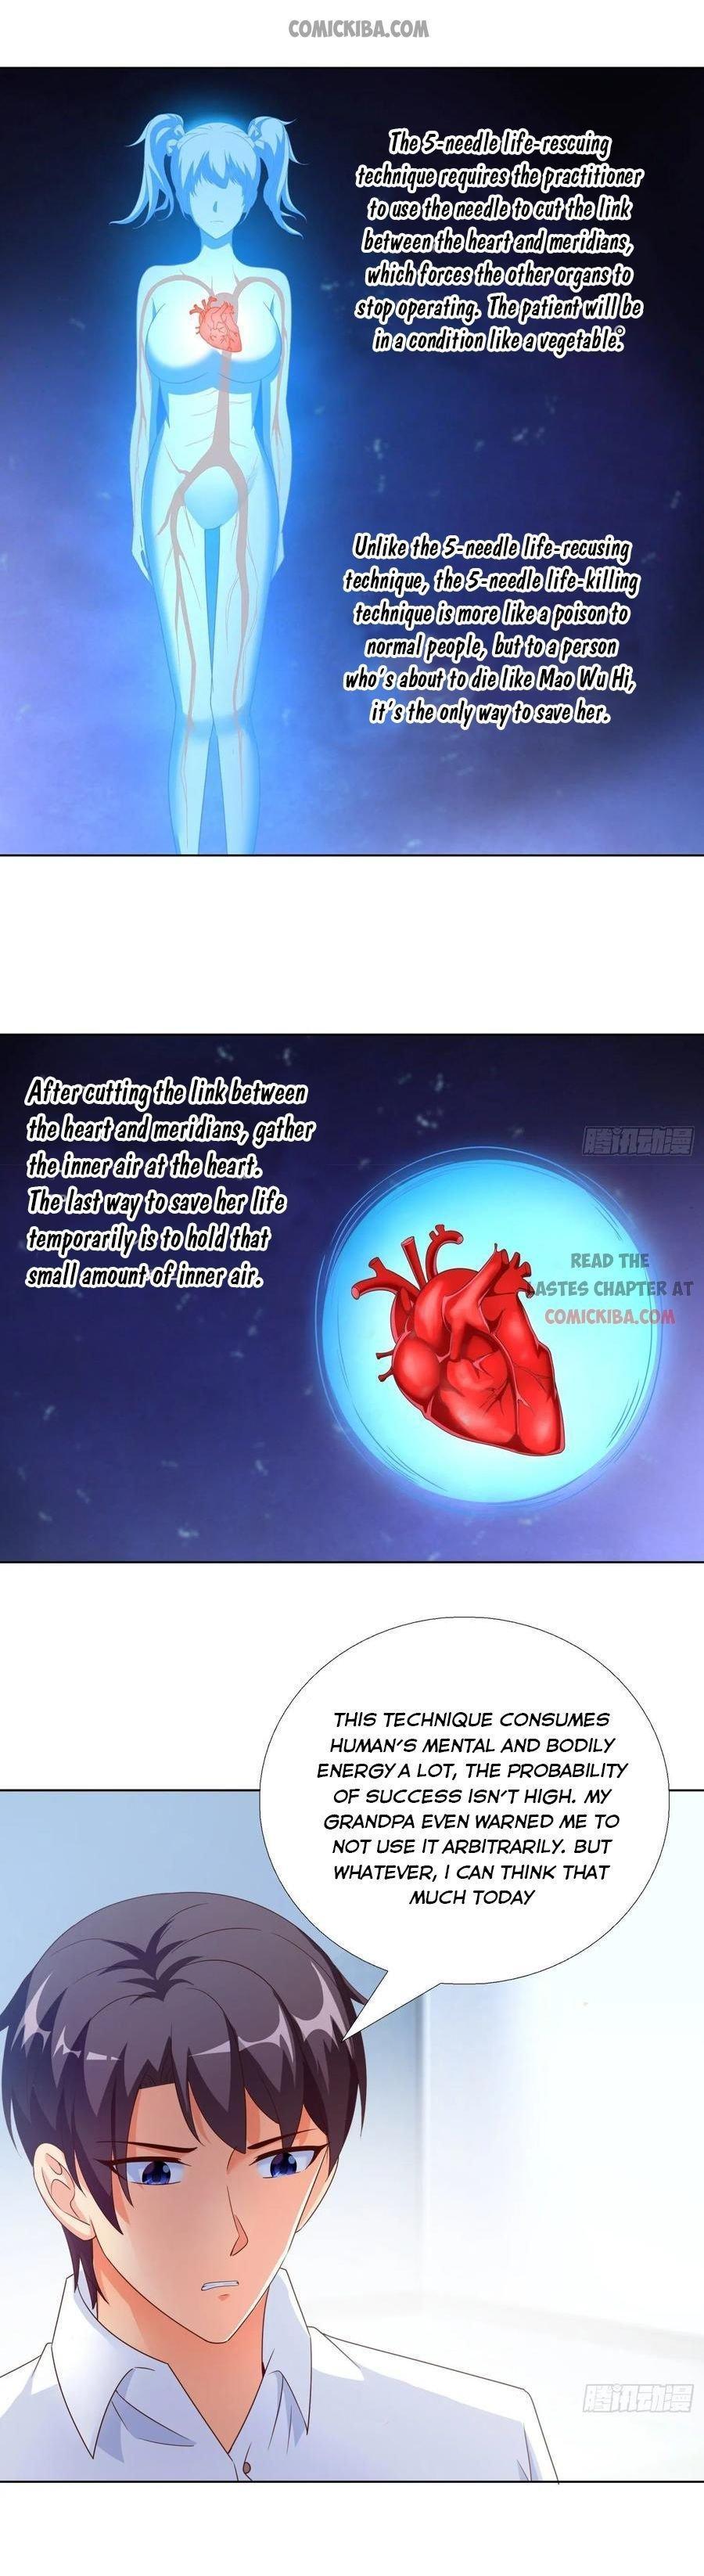 Super School Doctor Chapter 66 page 2 - Mangakakalots.com